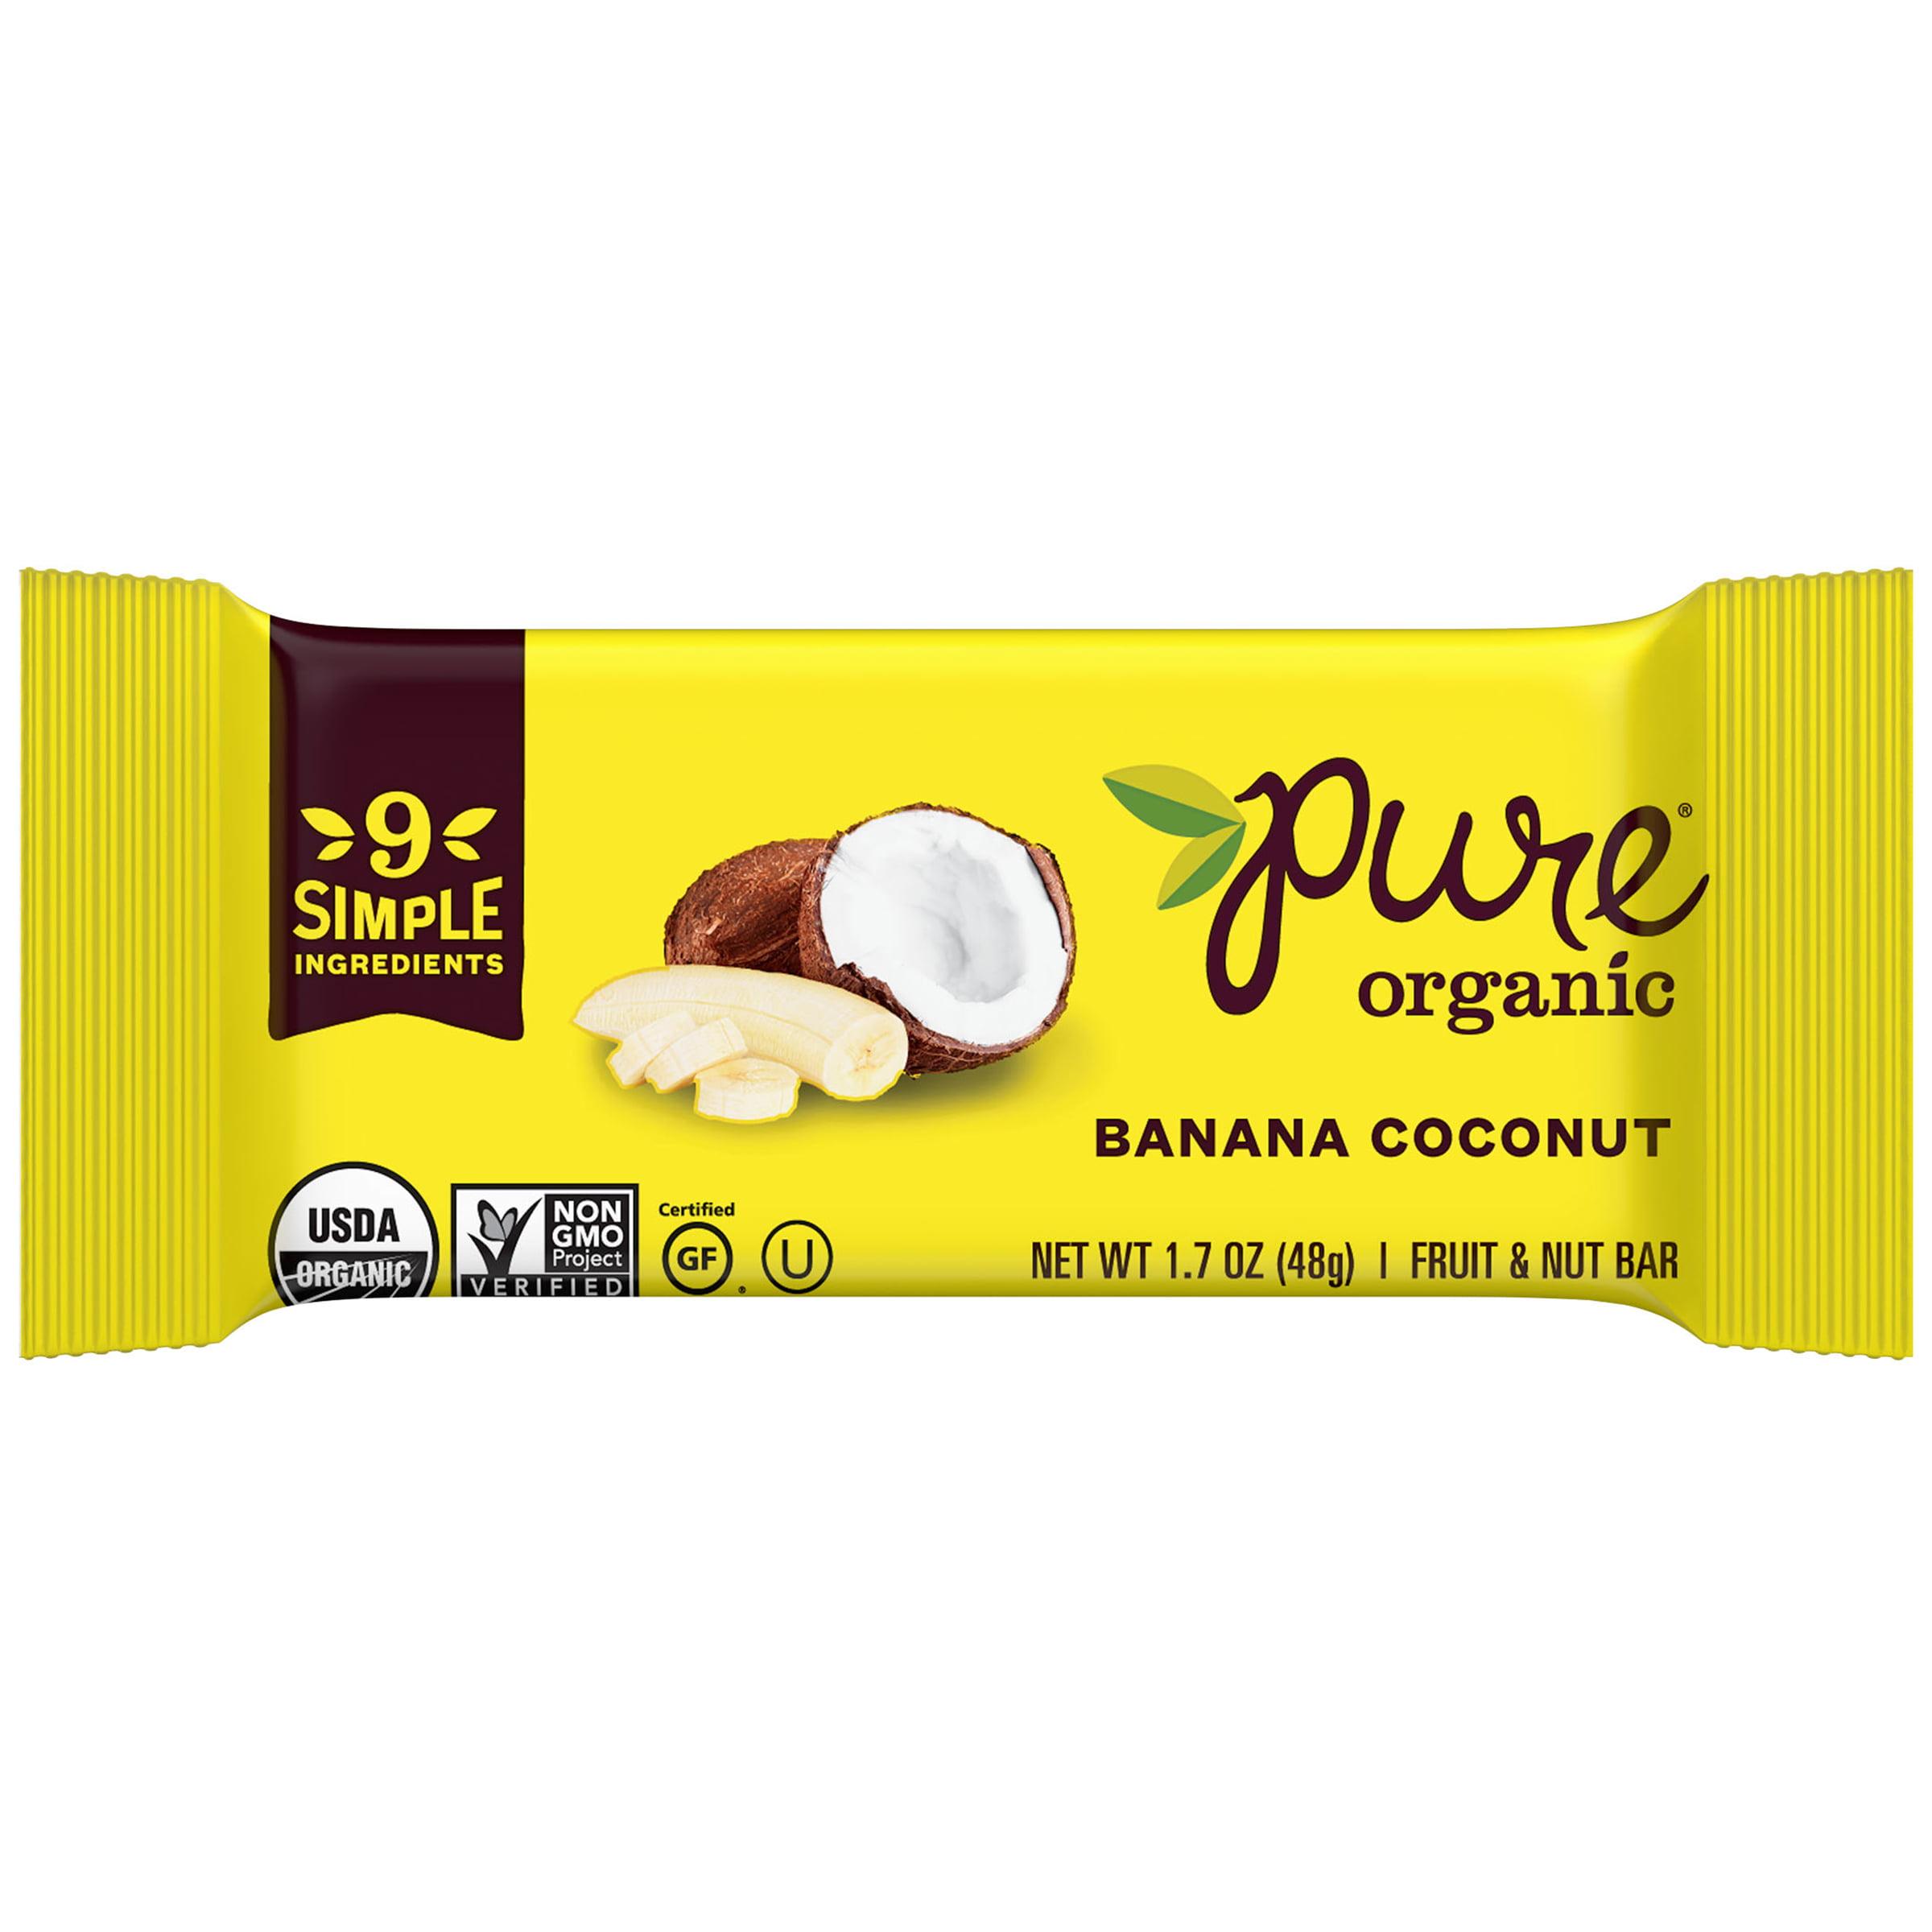 Pure® Organic Banana Coconut Fruit & Nut Bar 1.7 oz. Wrapper